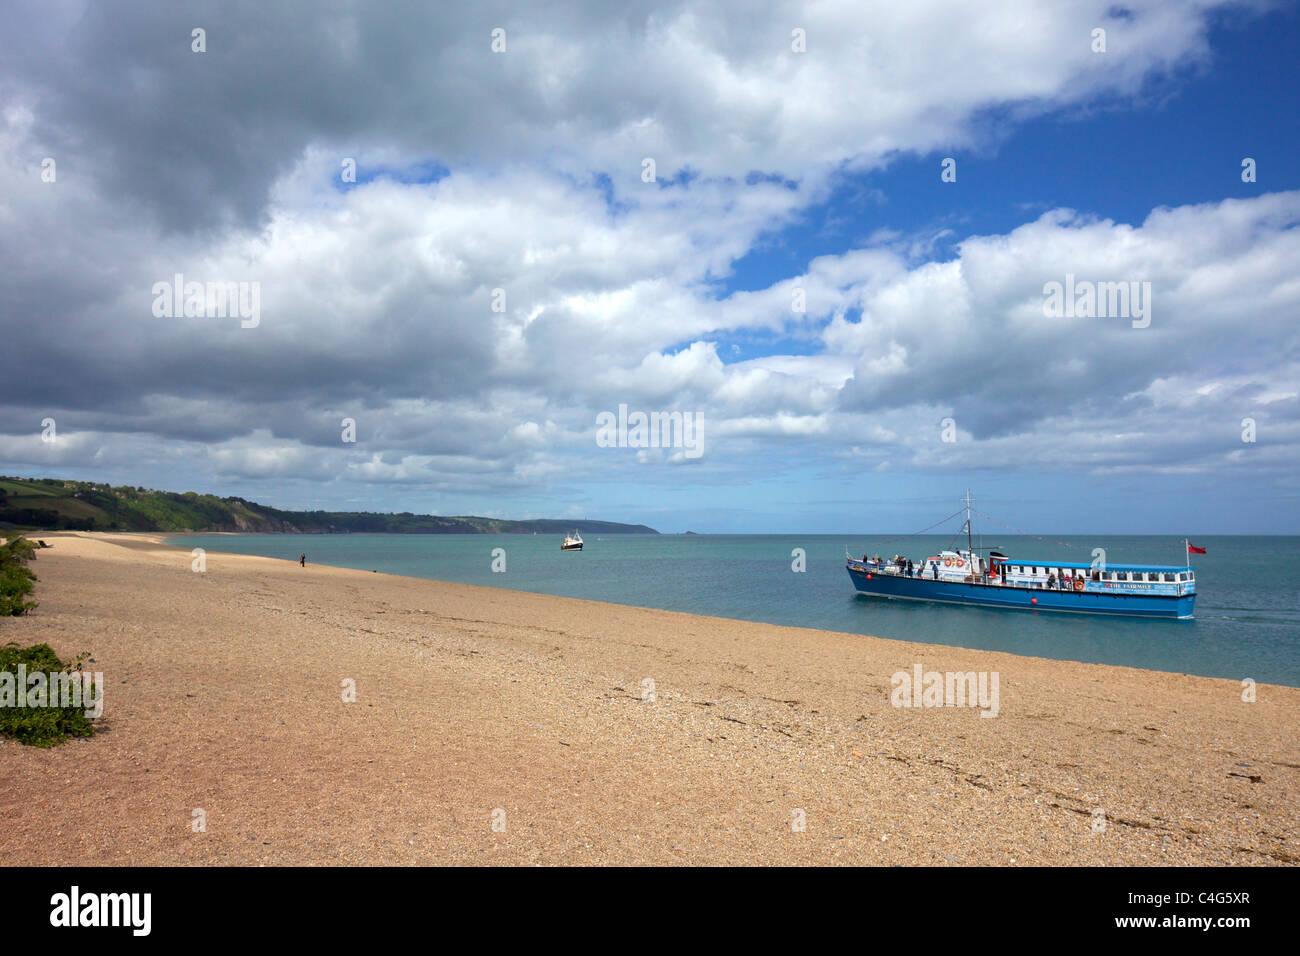 Fairmile passenger ship off Slapton Sands South Devon England UK  United Kingdom GB British Isles - Stock Image